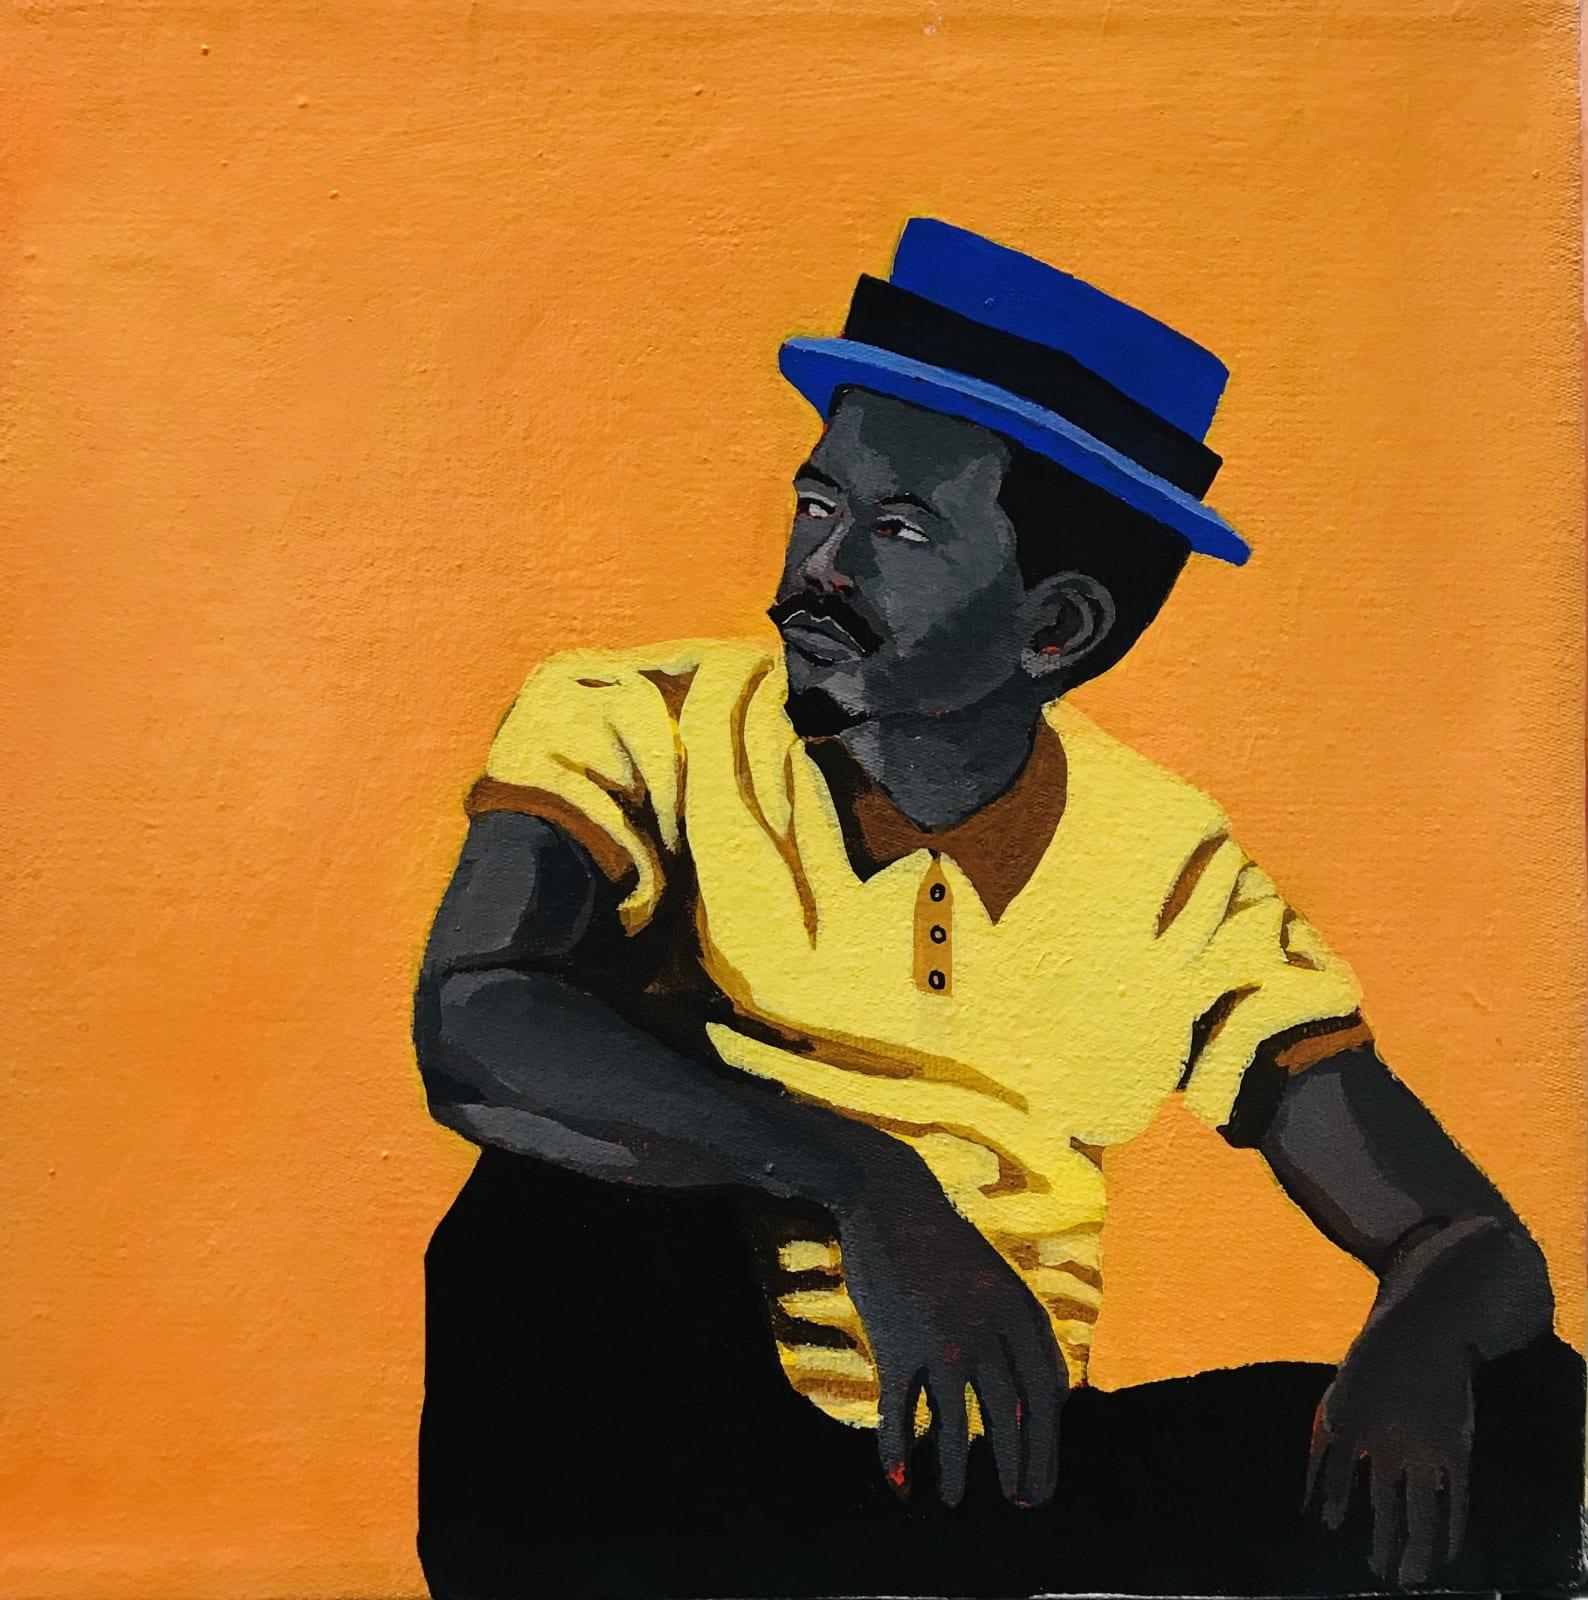 Mwana Wevhu (Son of the Soil)   Tafadzwa Tega